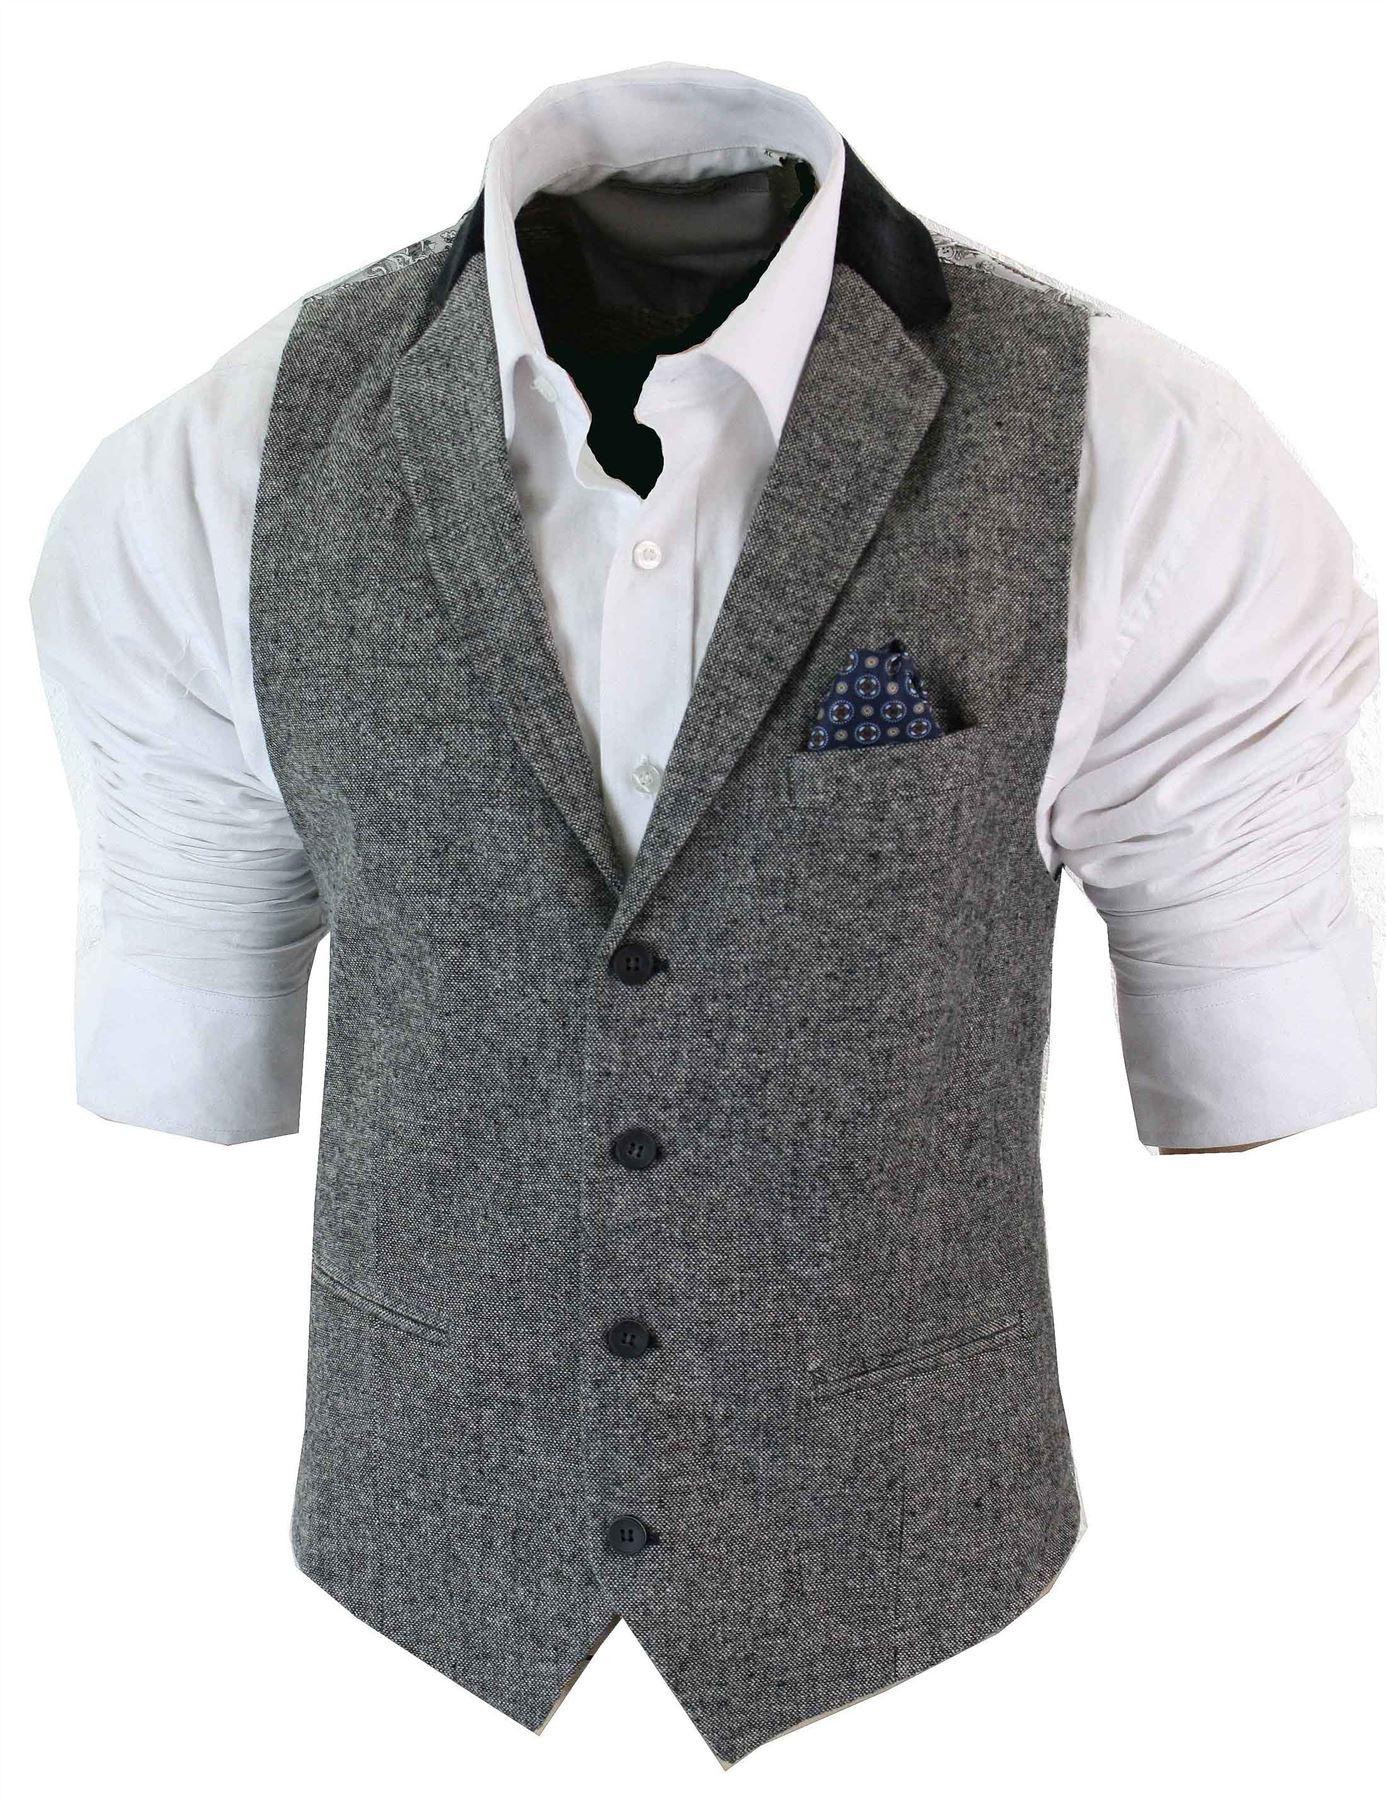 gilet homme veston vintage tweed chevrons marron noir cr me gris coupe cintr e ebay. Black Bedroom Furniture Sets. Home Design Ideas